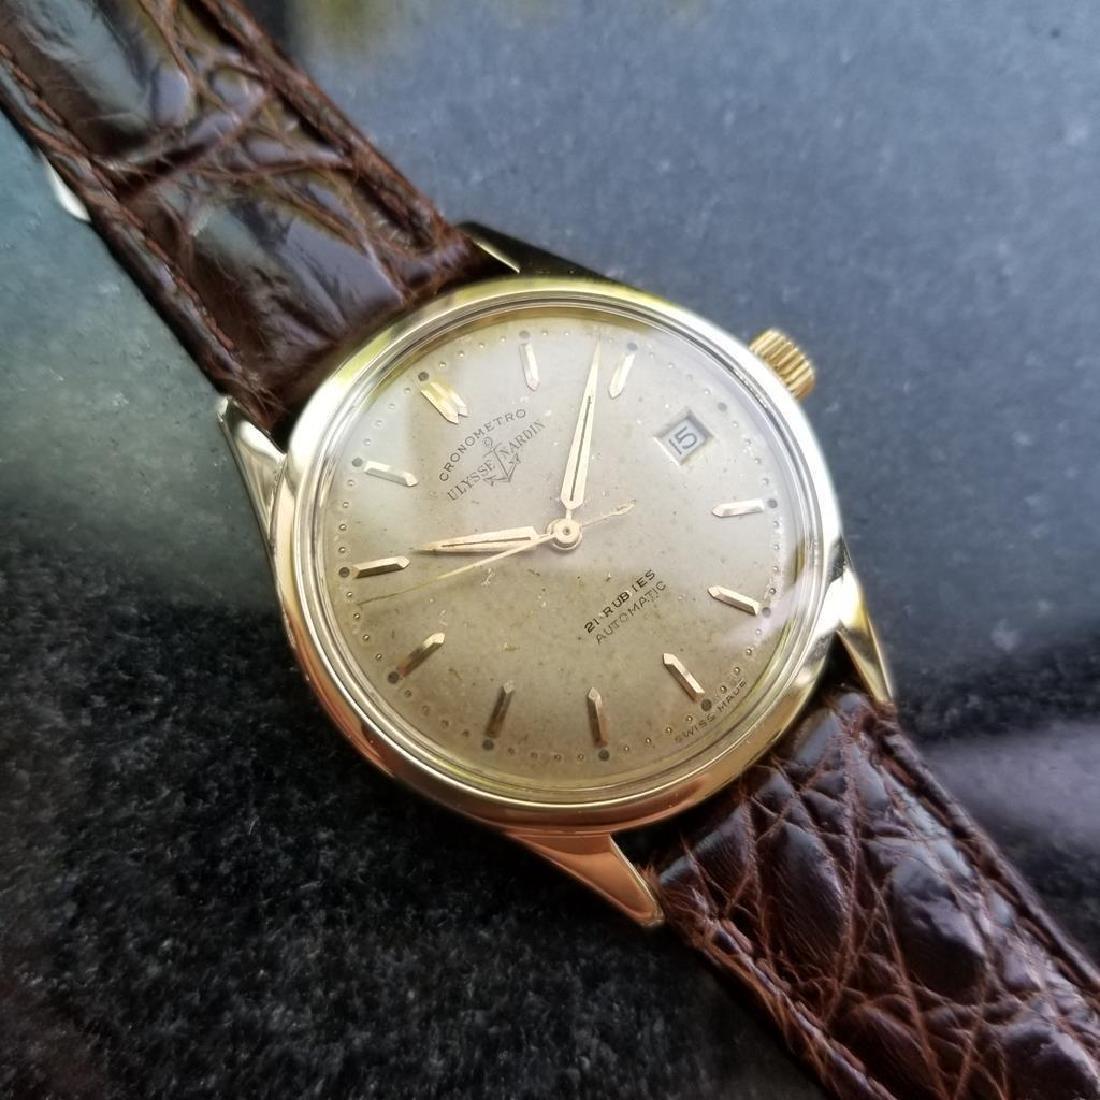 Vintage ULYSSE NARDIN Chronometer Automatic w/ date - 5